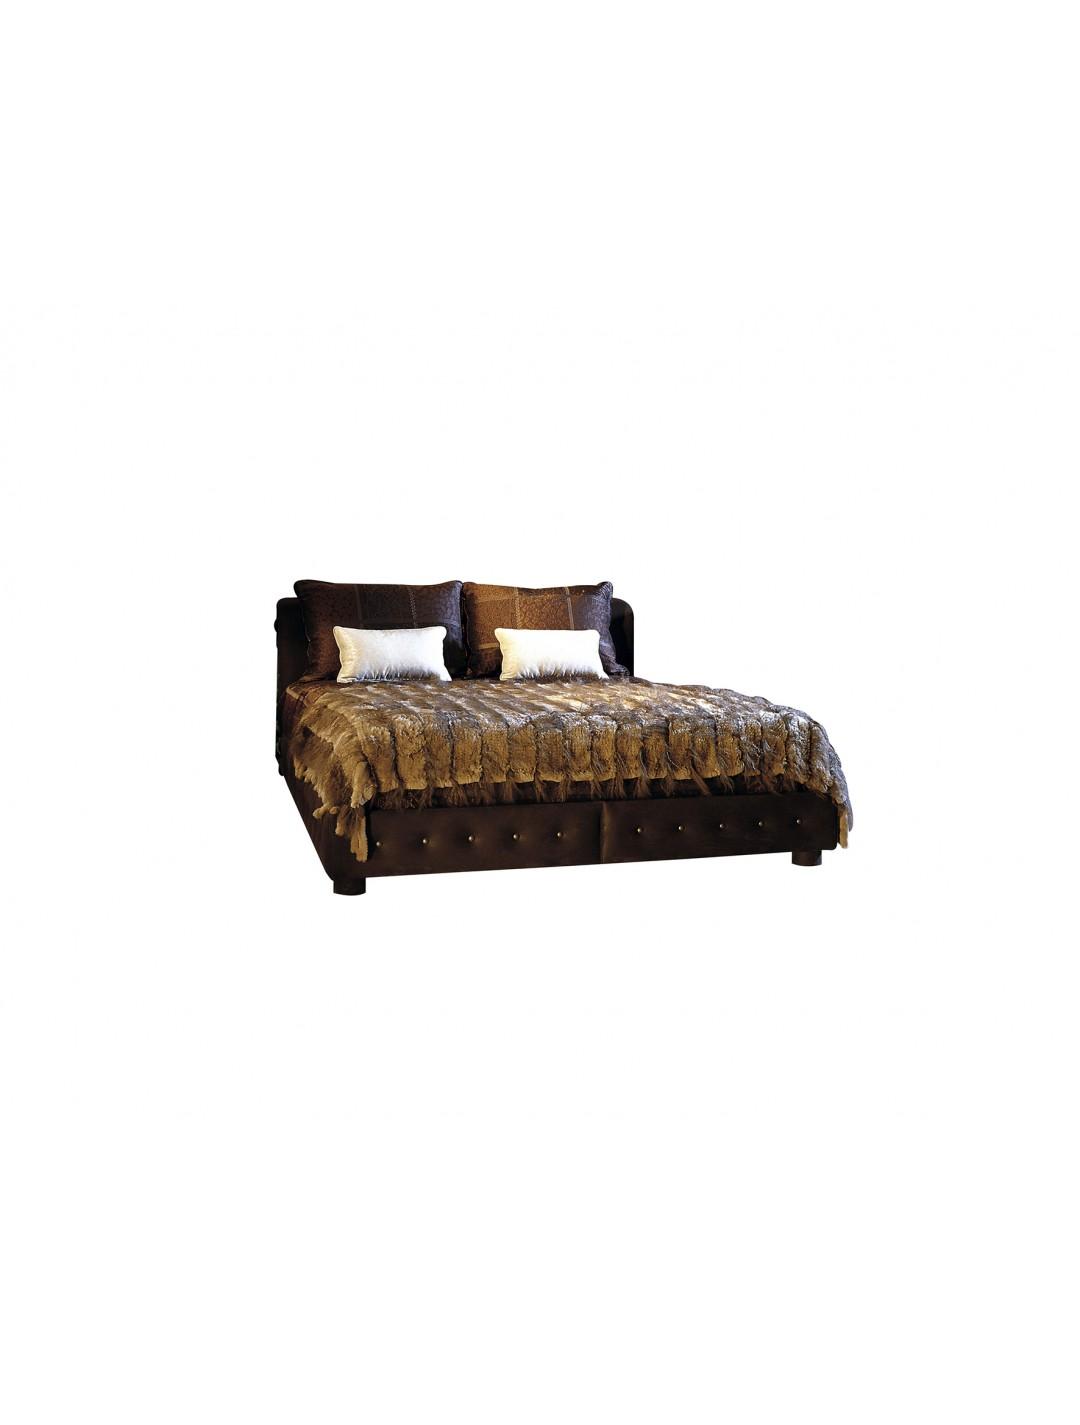 VICTORIA BED (FOR 180X200 CM MATTRESS)